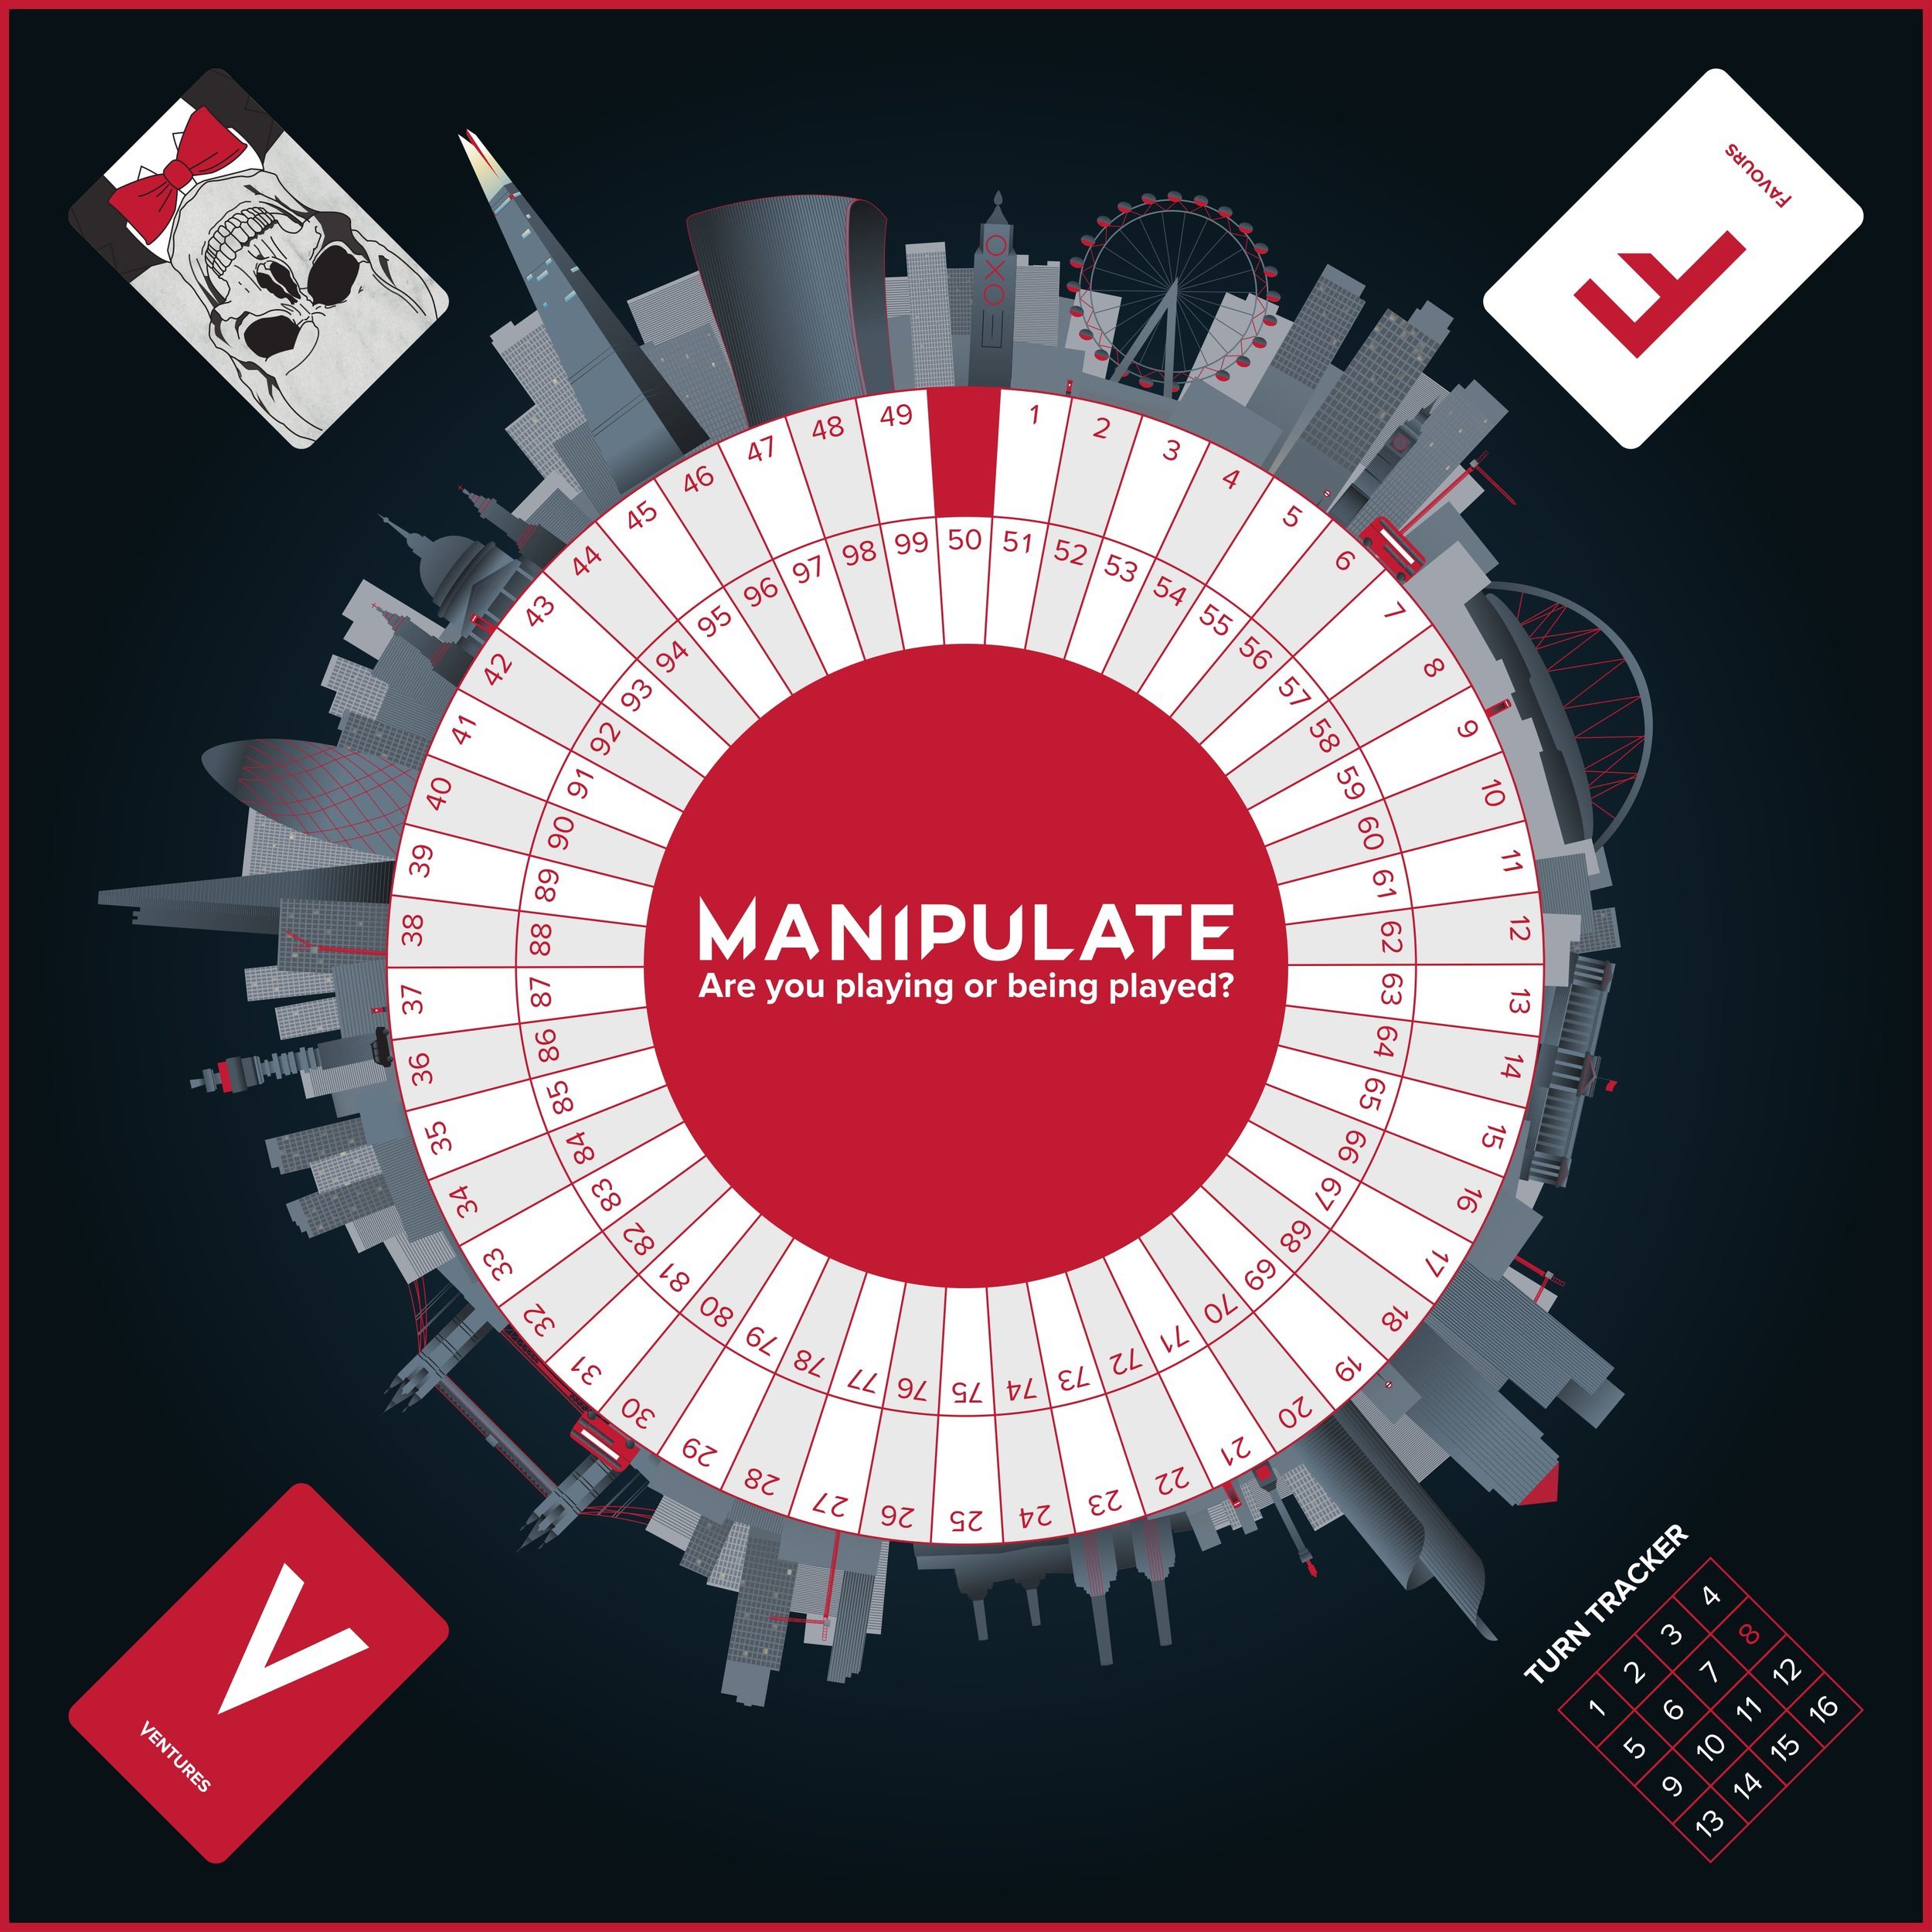 MANIPULATE_AW15_board-HRvisual-1.jpg